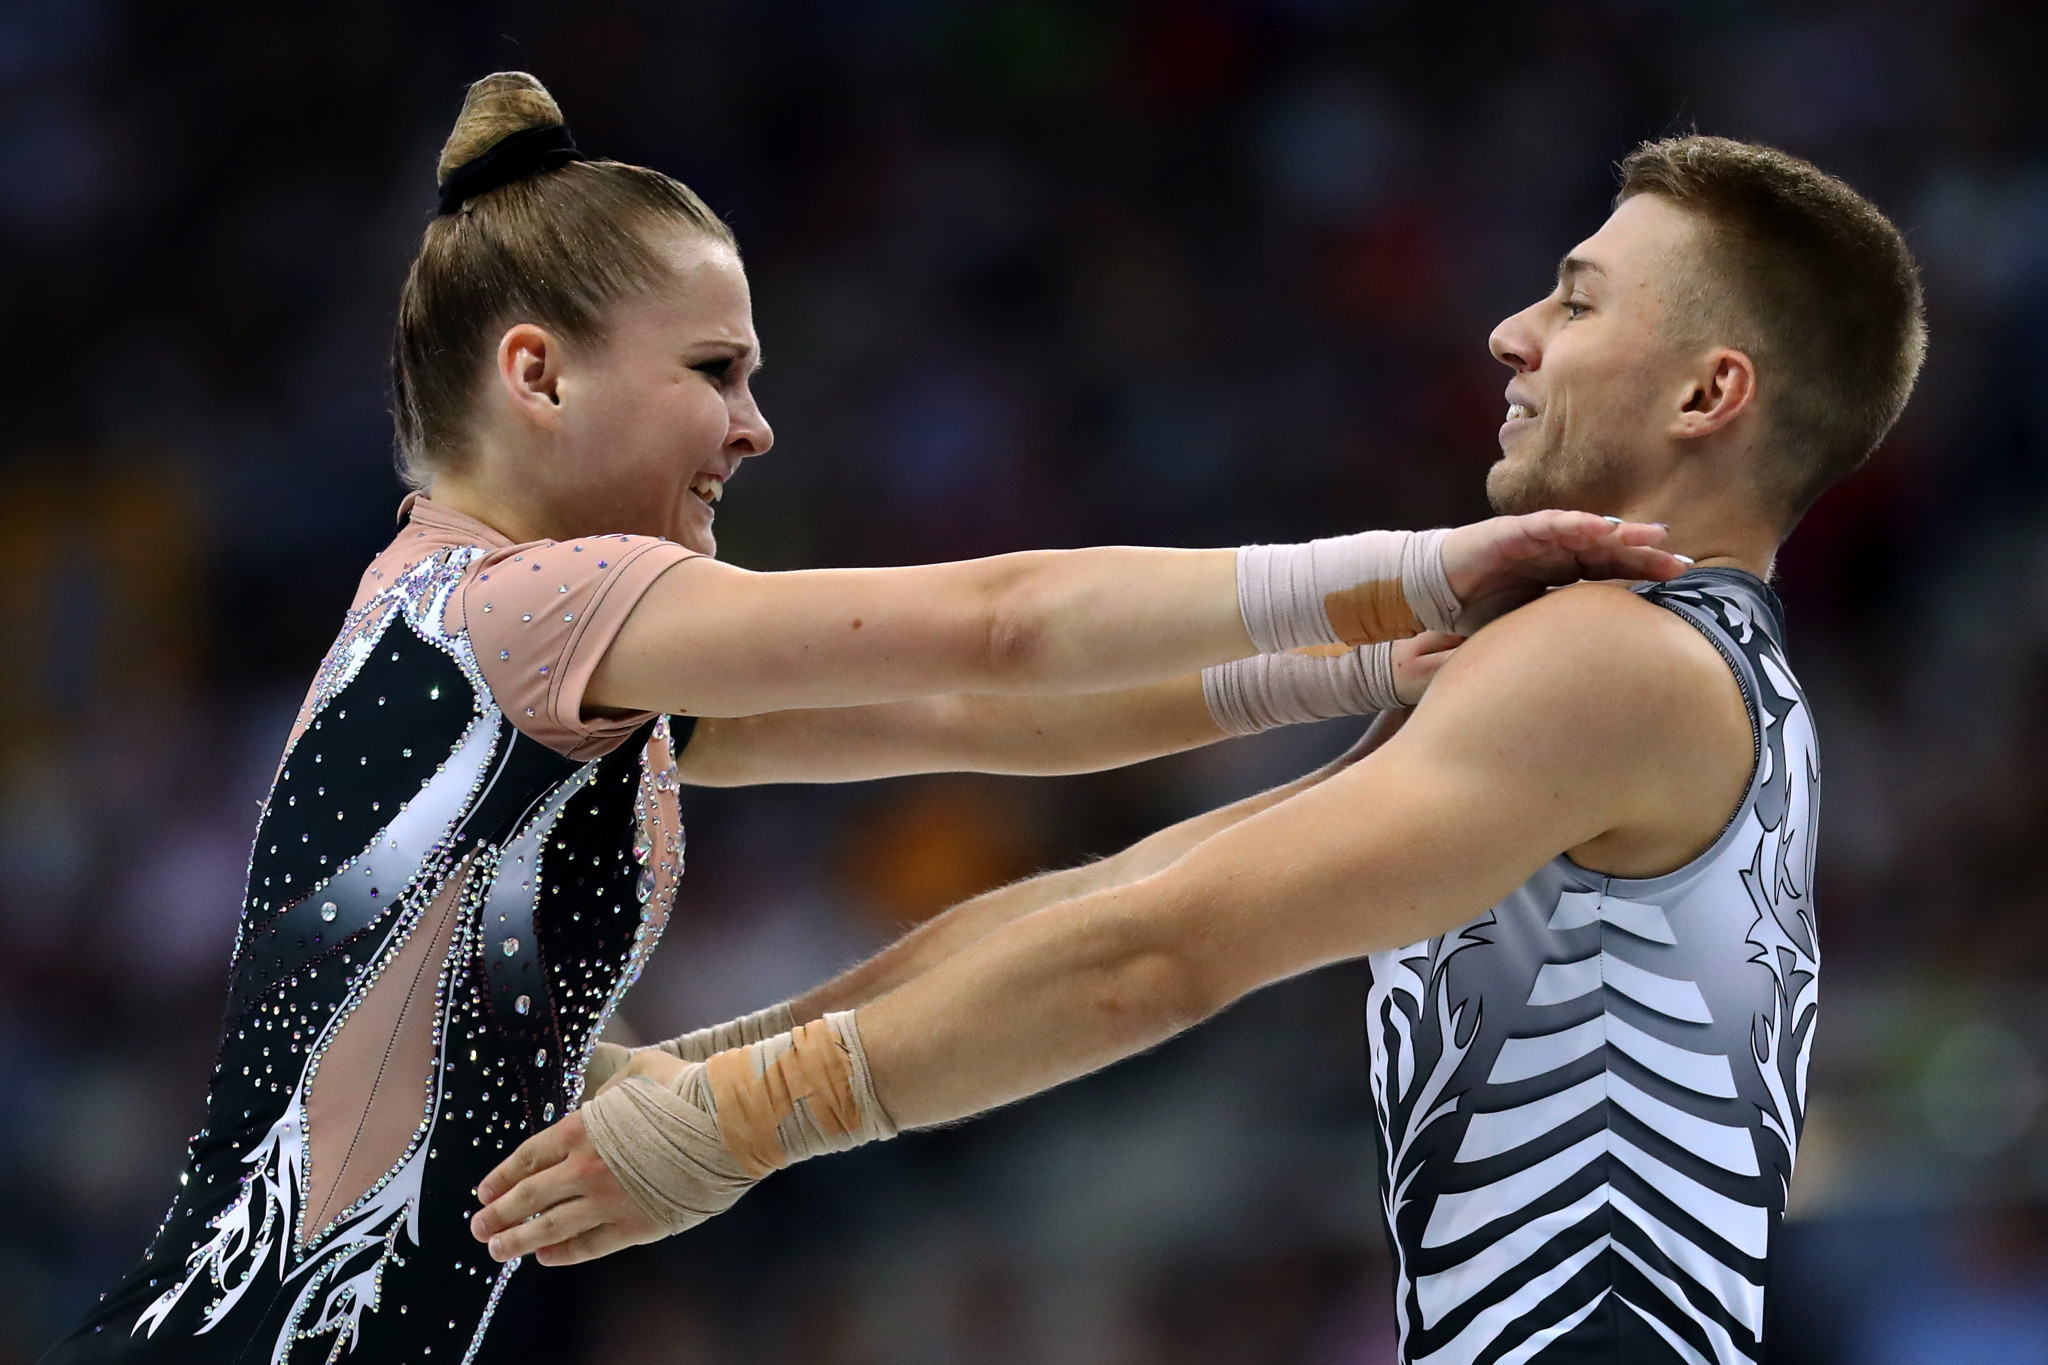 Onbasi tops women's qualification at Aerobic Gymnastics World Championships